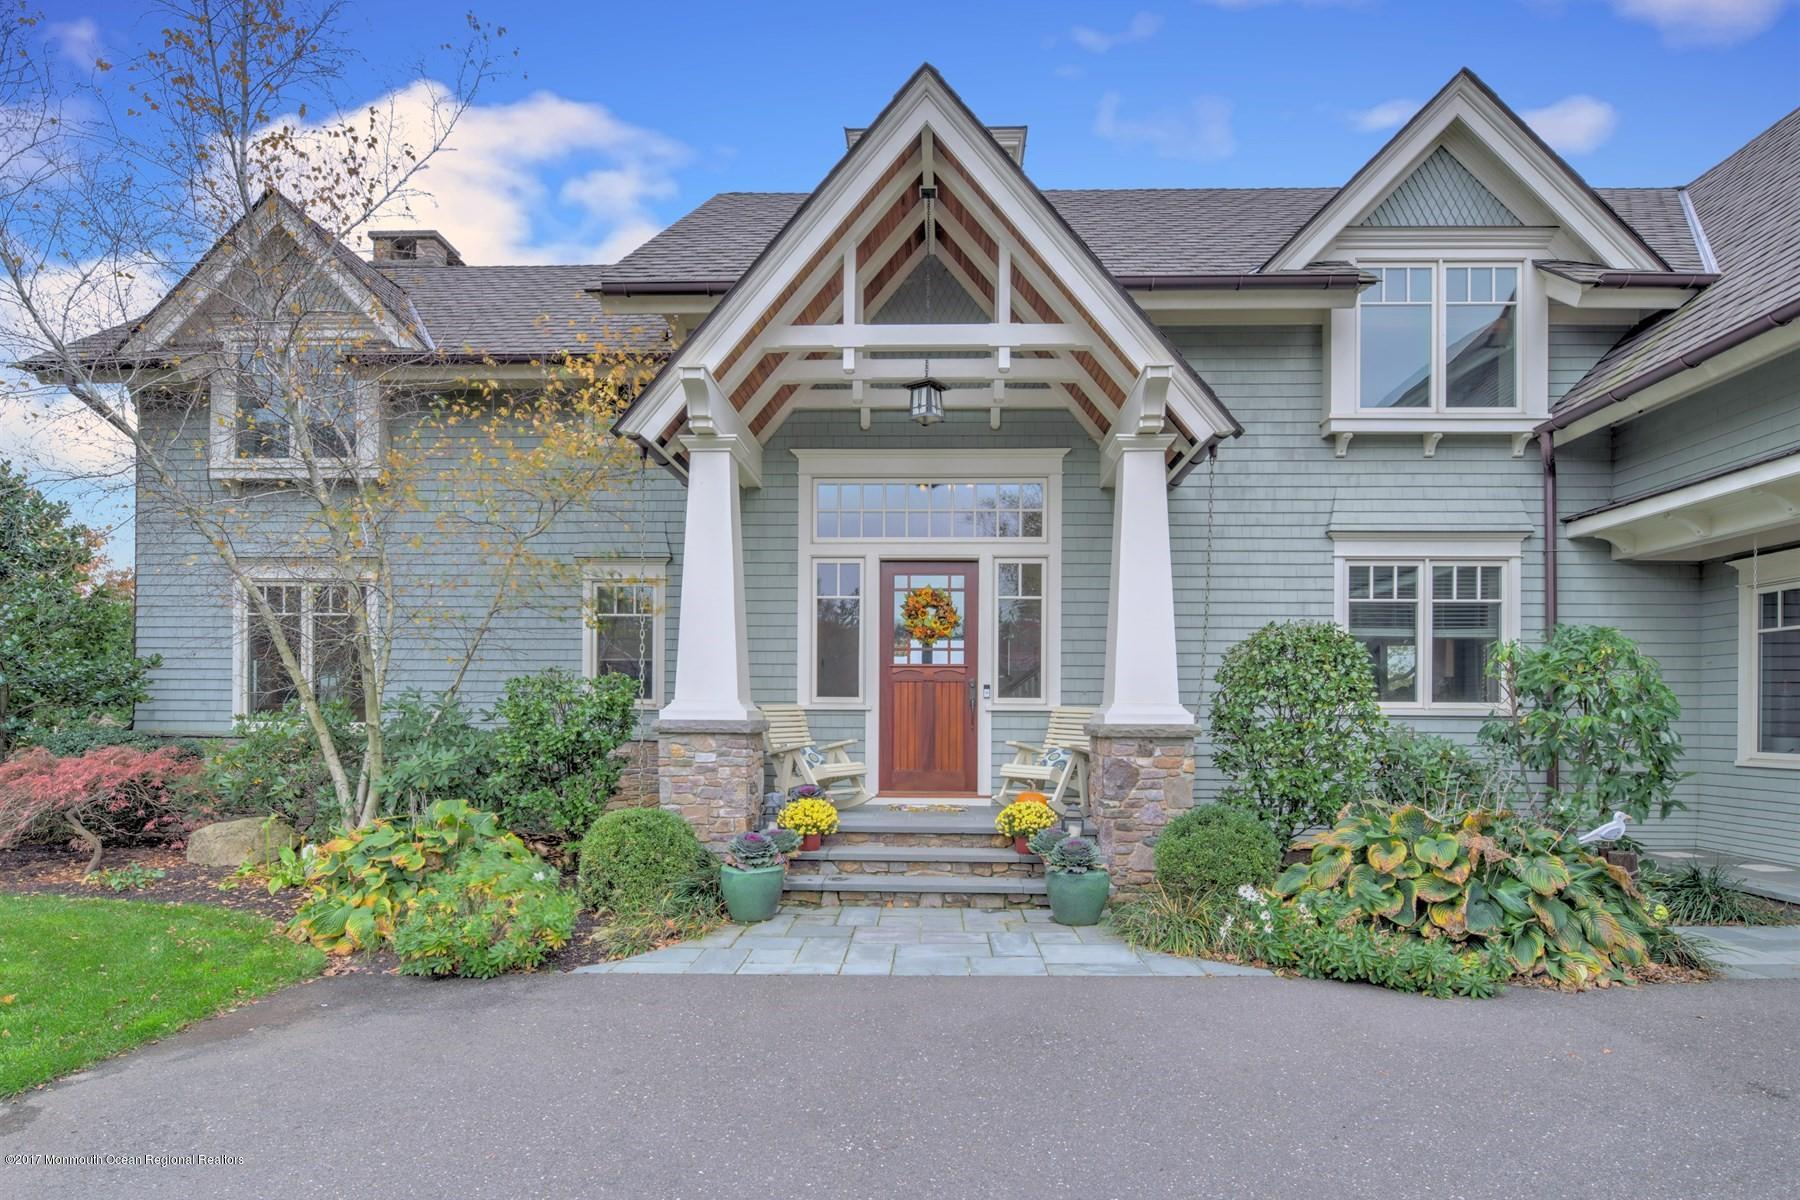 15 CARRIAGE HOUSE LANE, LITTLE SILVER, NJ 07739